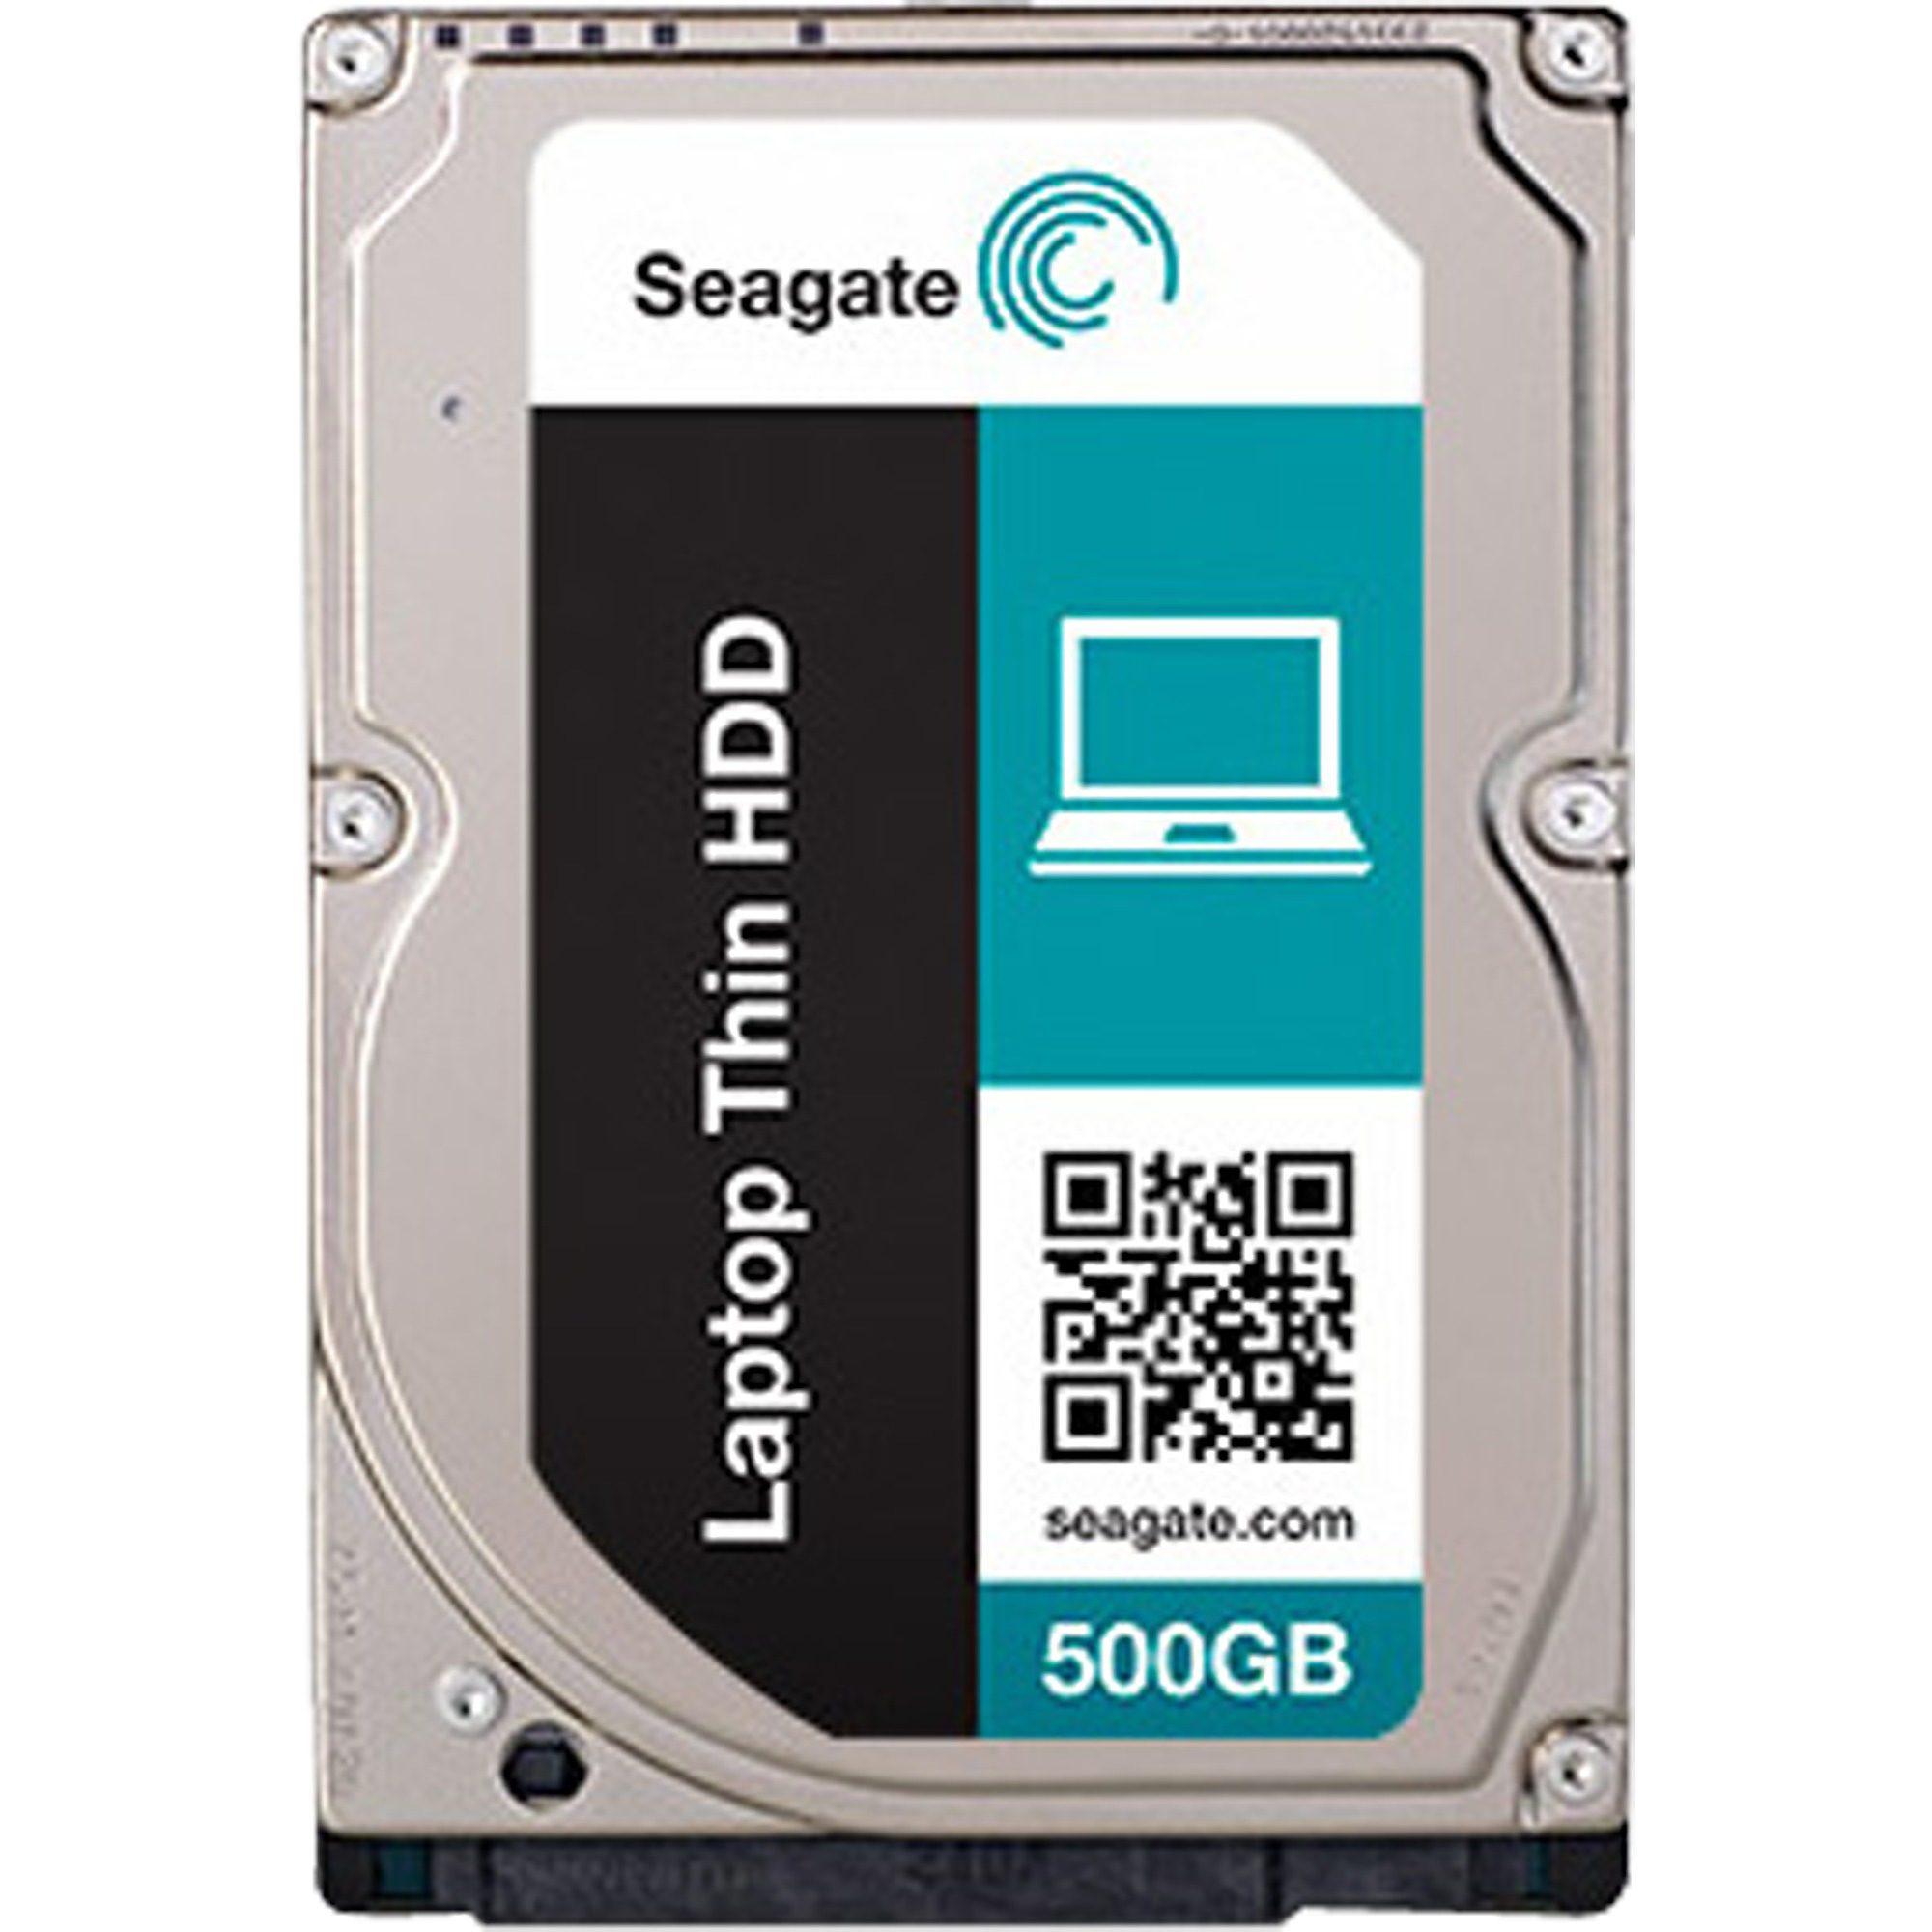 Seagate Festplatte »ST500LM021 500 GB«